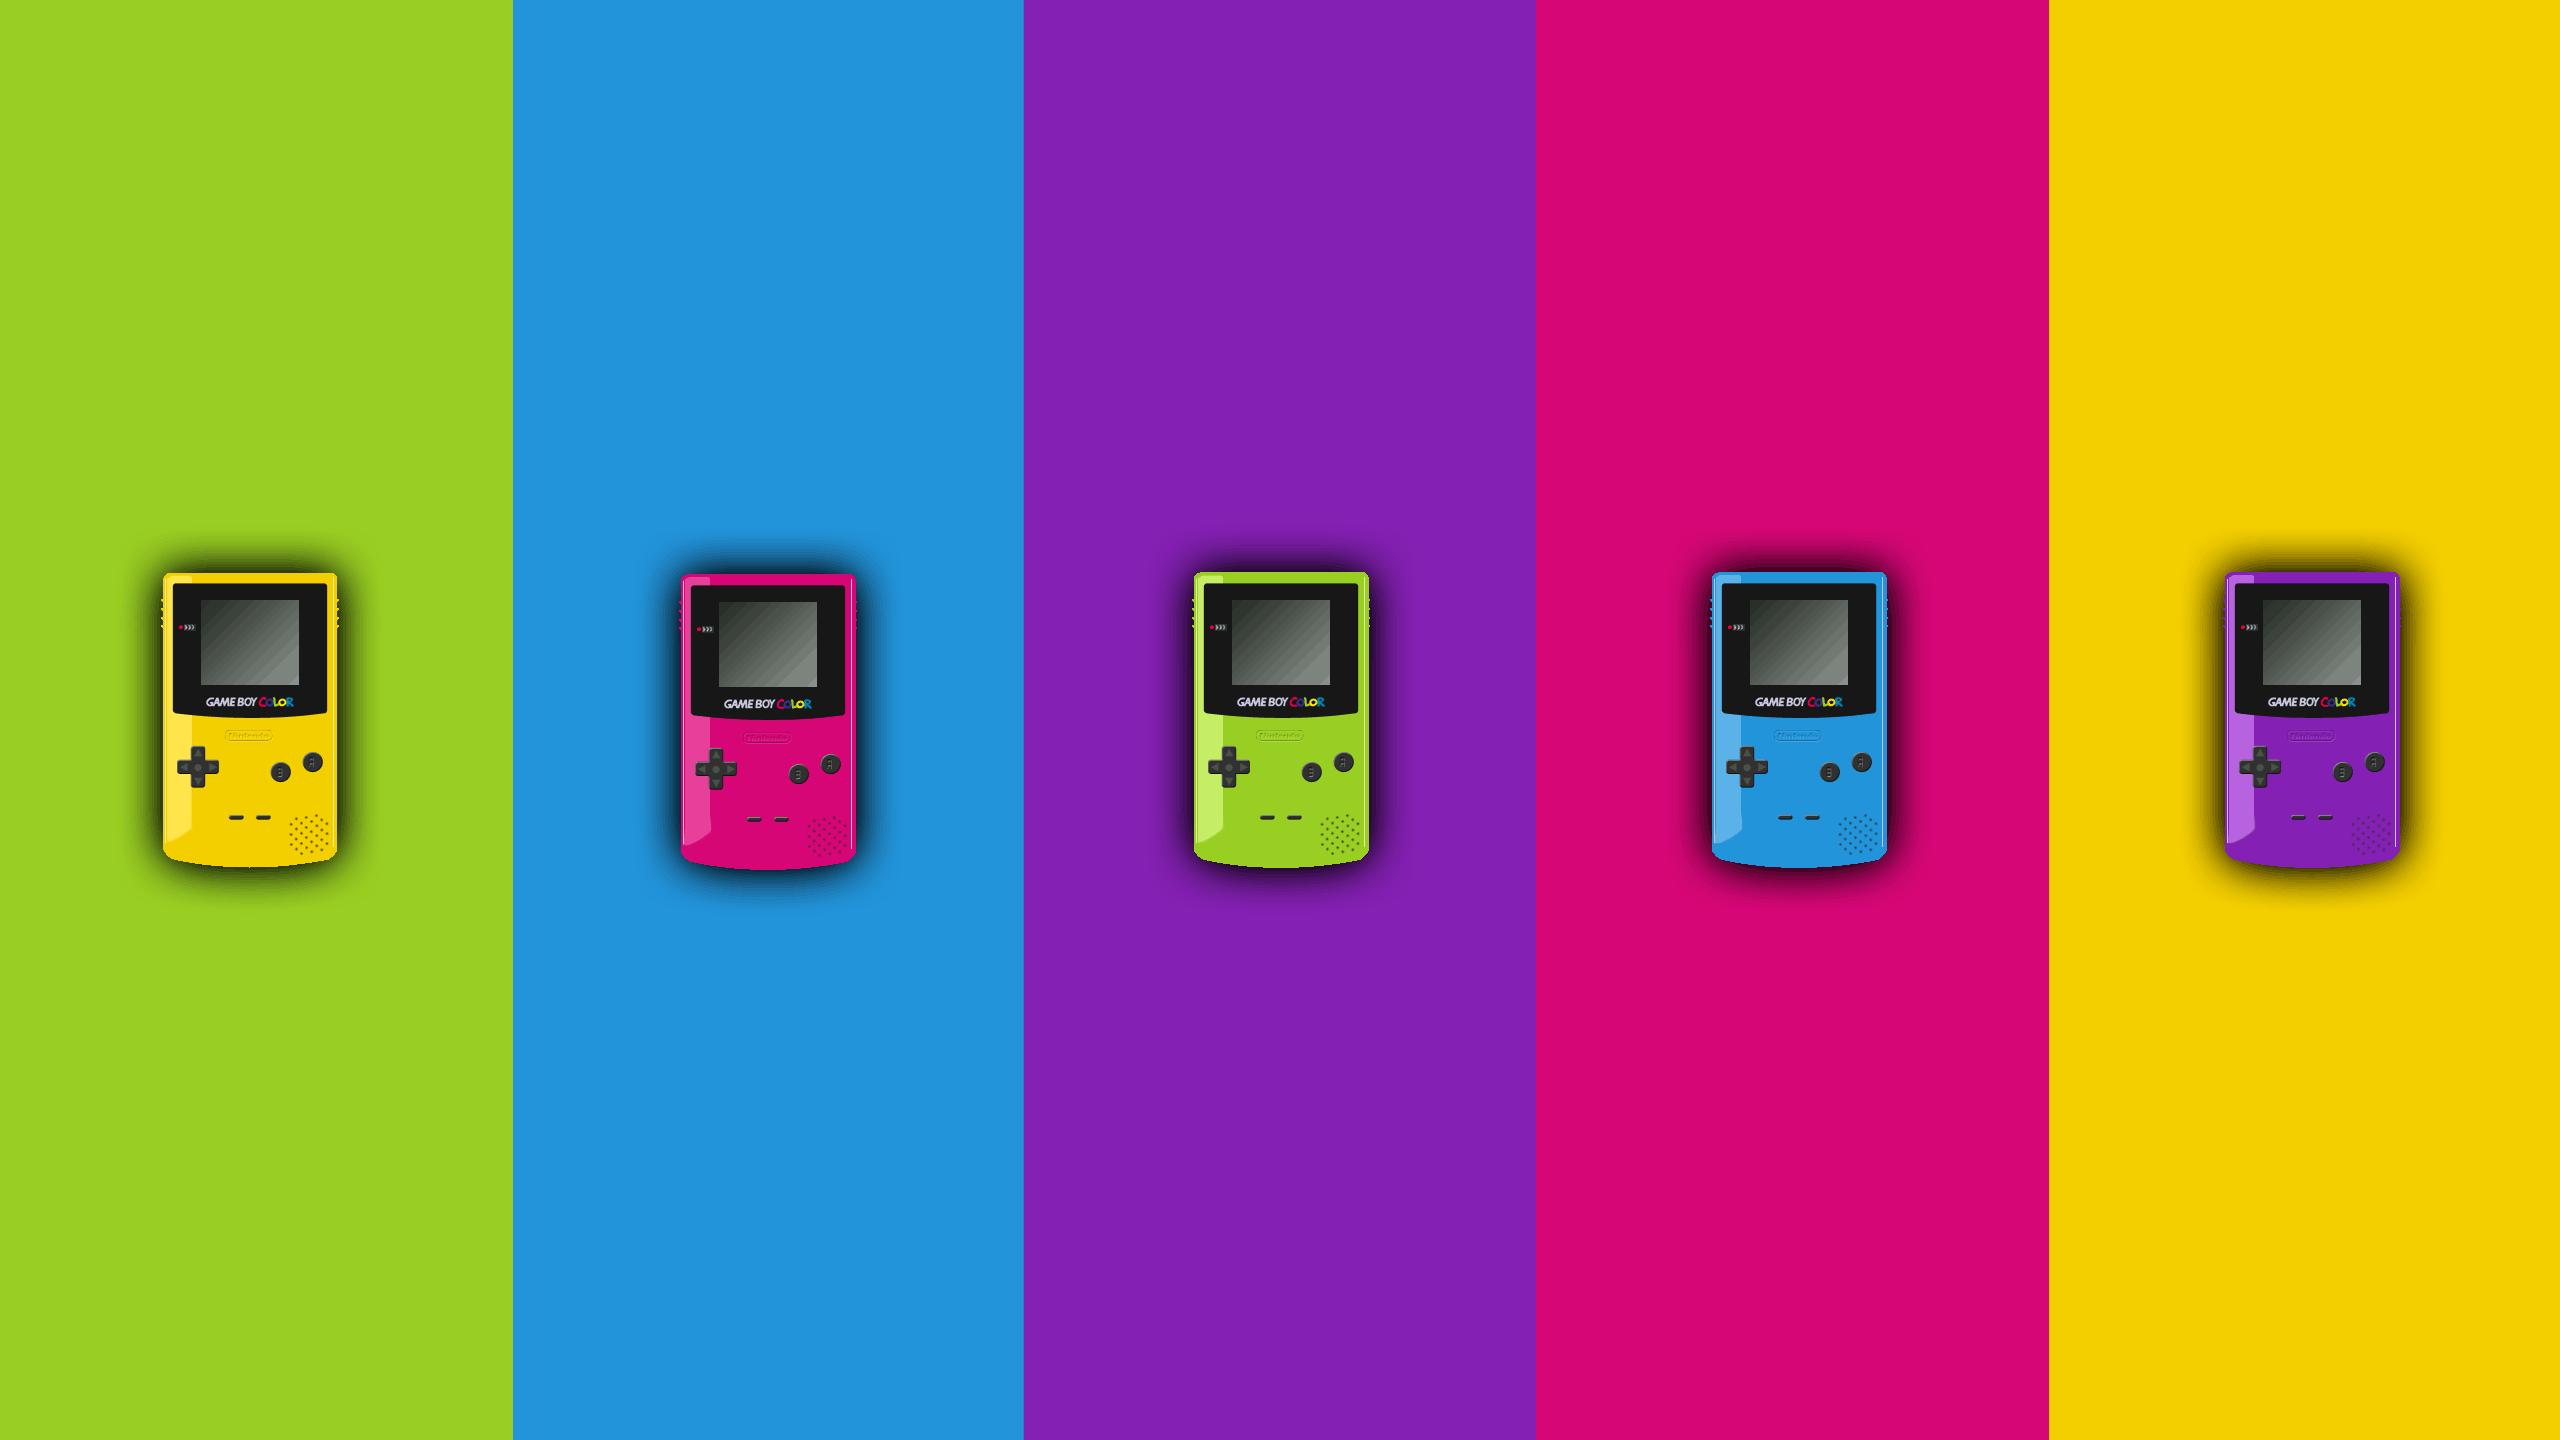 Nintendo game boy color youtube - Ga Gameboy Color Pokemon Youtube Gameboy_wallpaper_index_colour_mode__2560x1440__by_acefecoo D6767lt